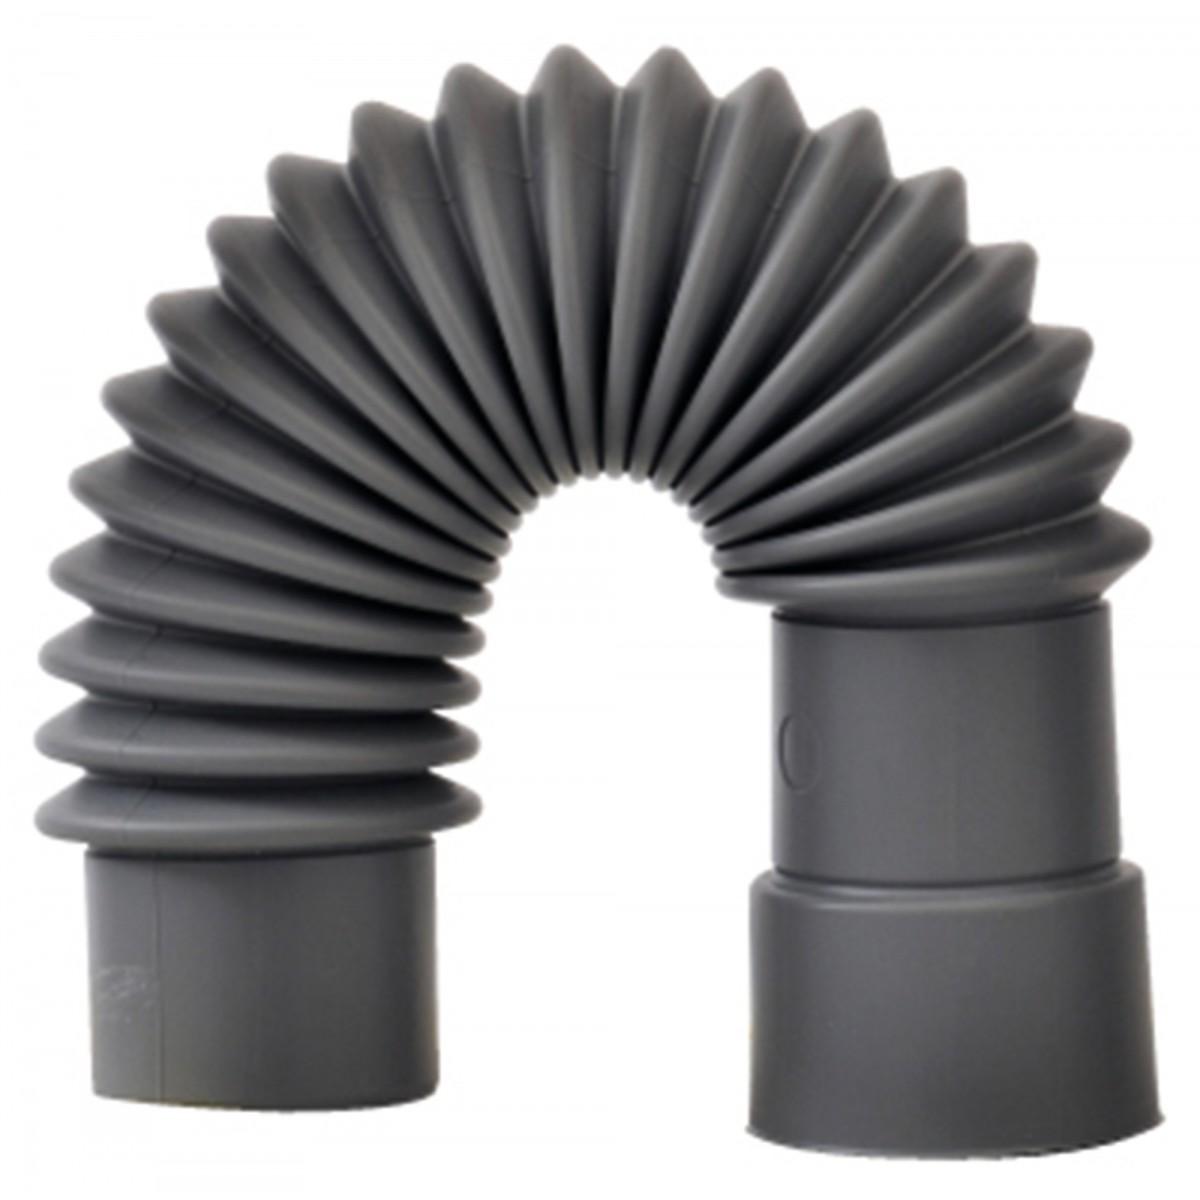 Manchette flexible universelle Coudix Girpi - Diamètre 50 mm